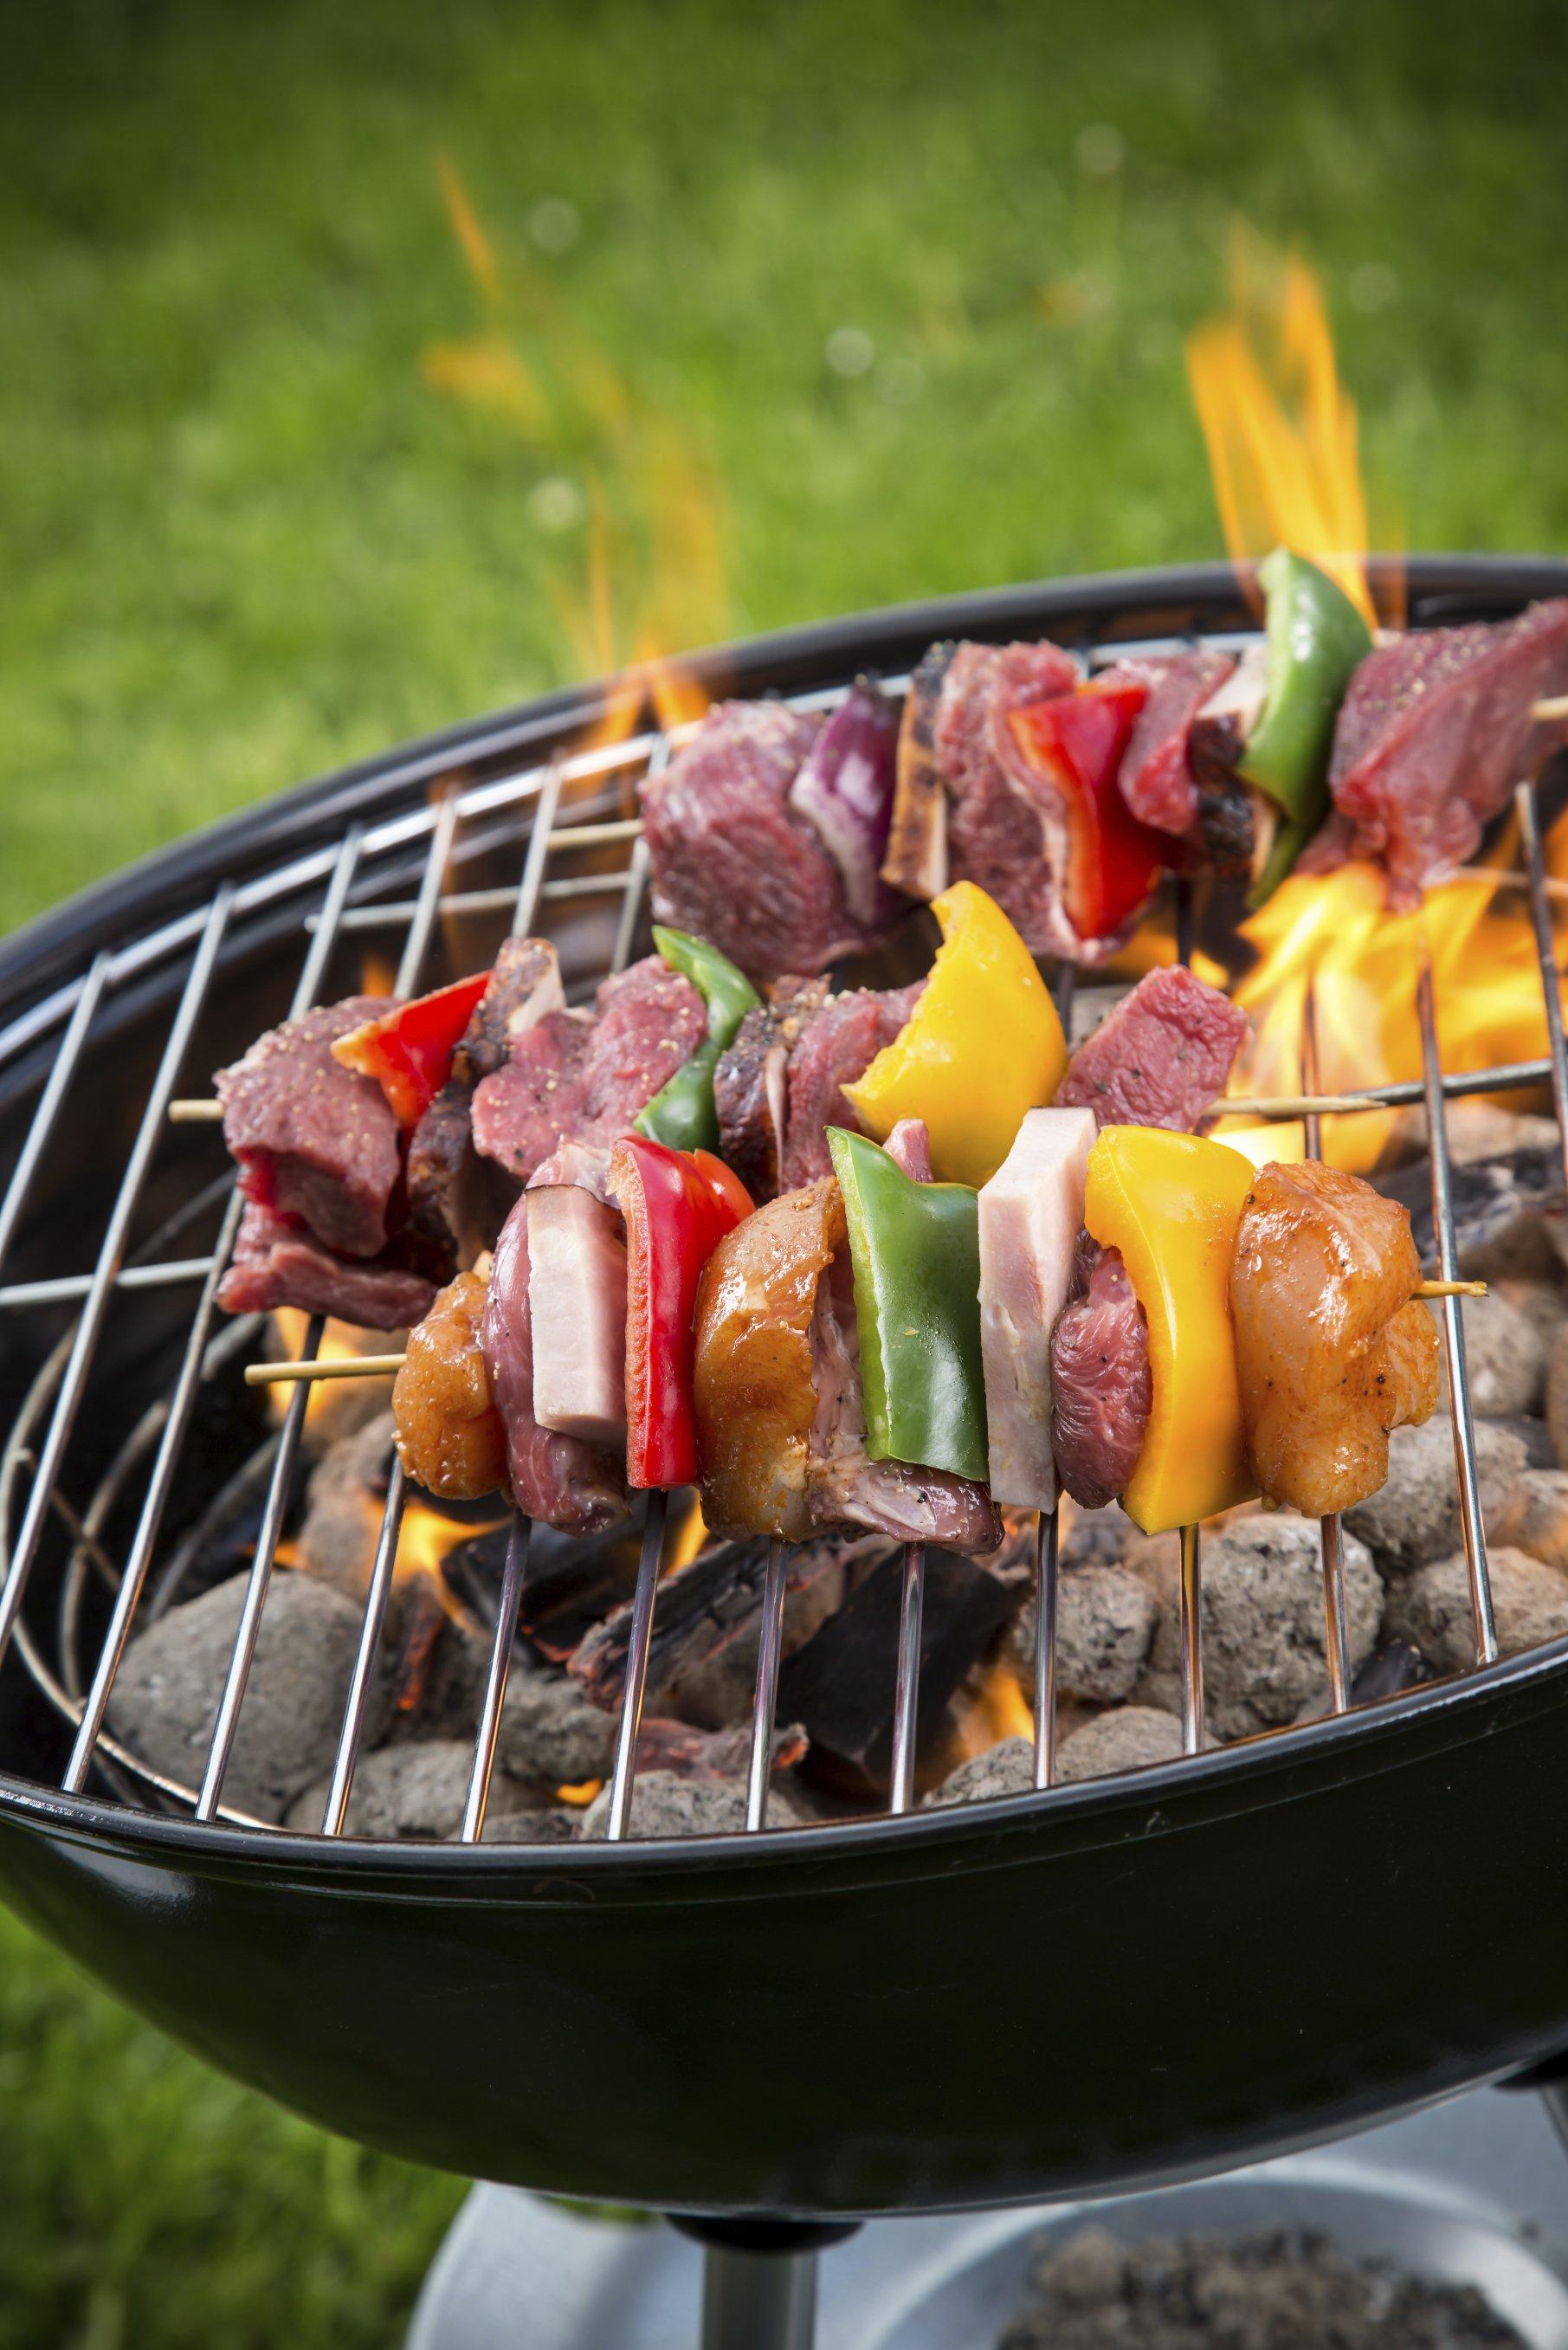 Better Than Burgers: 28 Unique Grilling Recipes